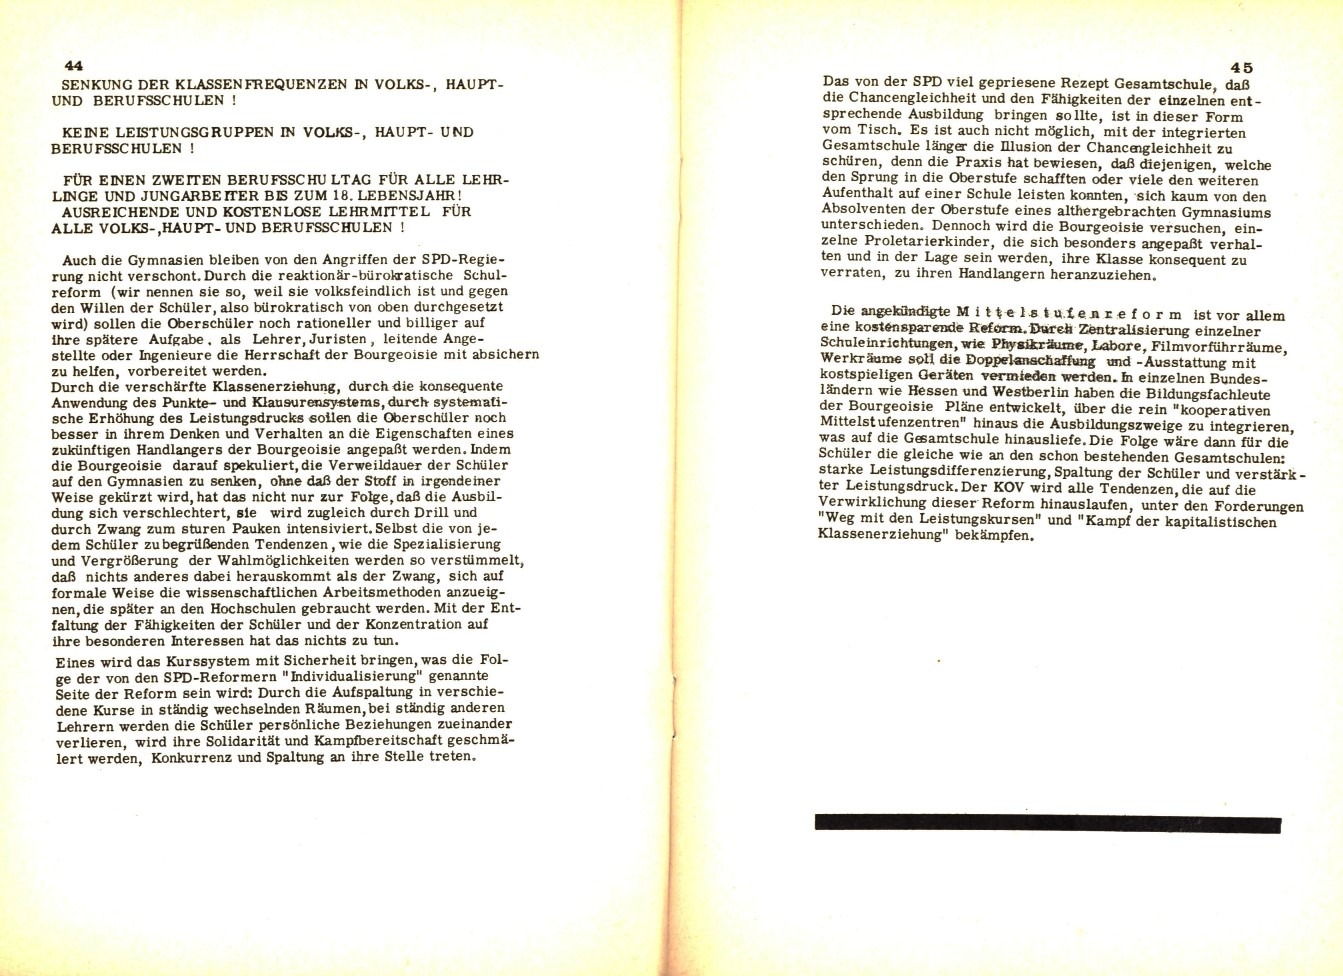 KOV_1973_Aktionsprogramm_25